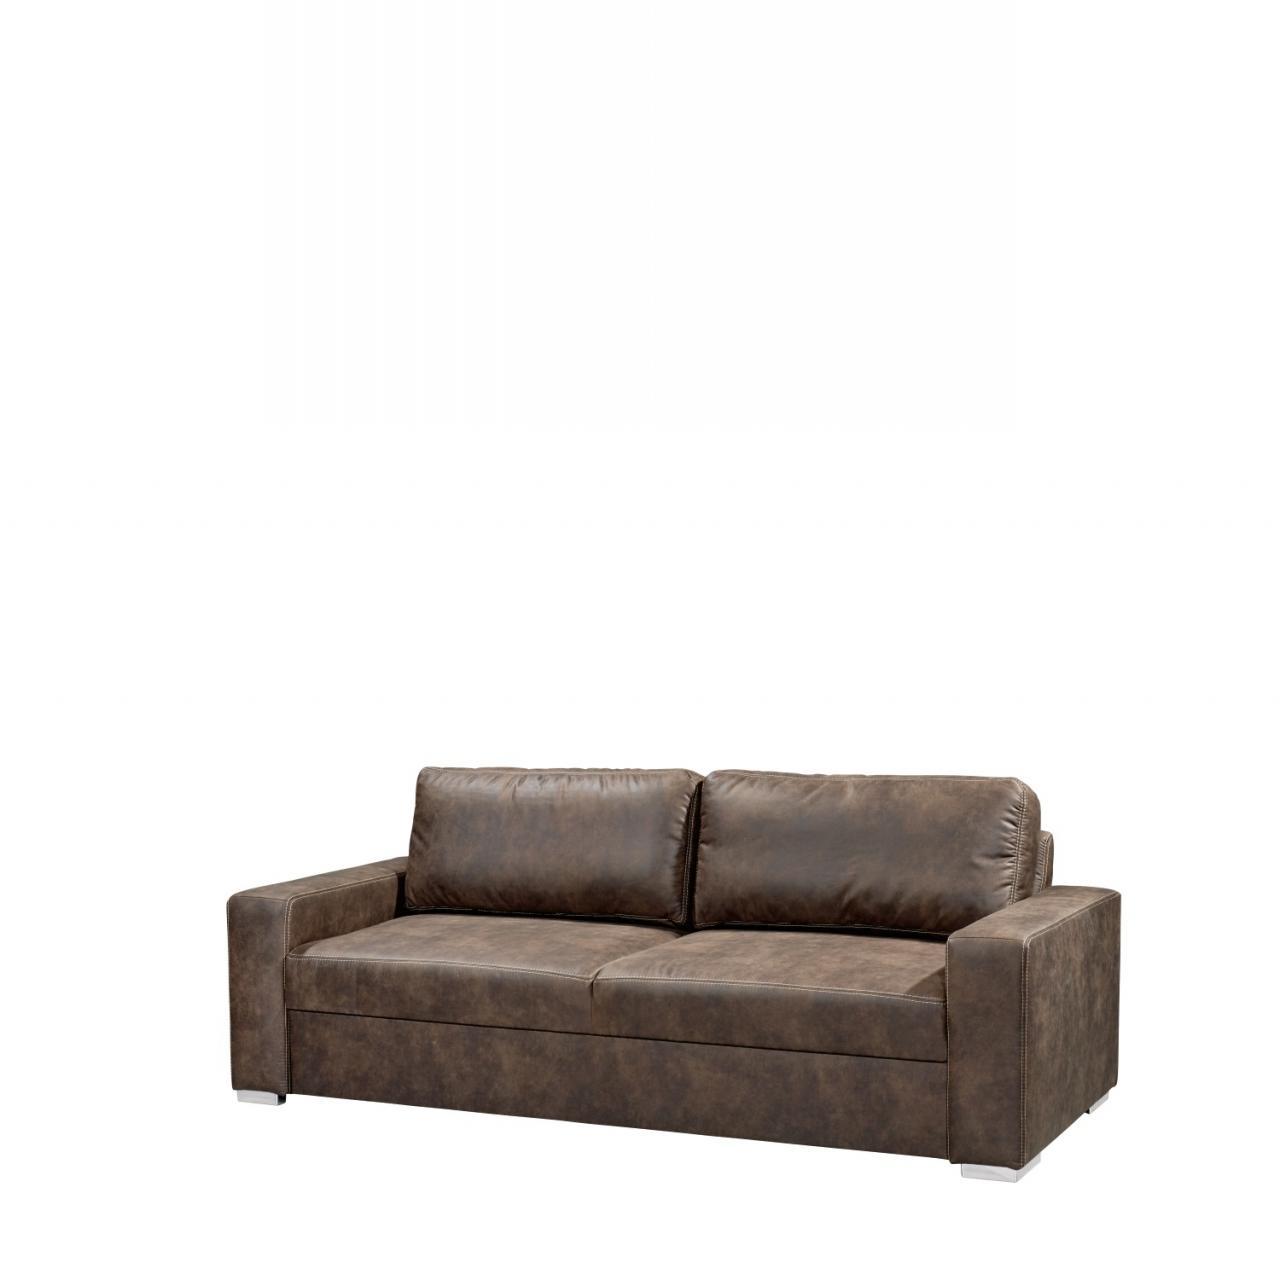 Full Size of 3er Sofa Regina Dunkelbraun Polstergarnitur Couch Inkl U Form Togo Zweisitzer Delife Himolla Kaufen Günstig Schlaf Xxl Grau Bullfrog Petrol Sofa 3er Sofa